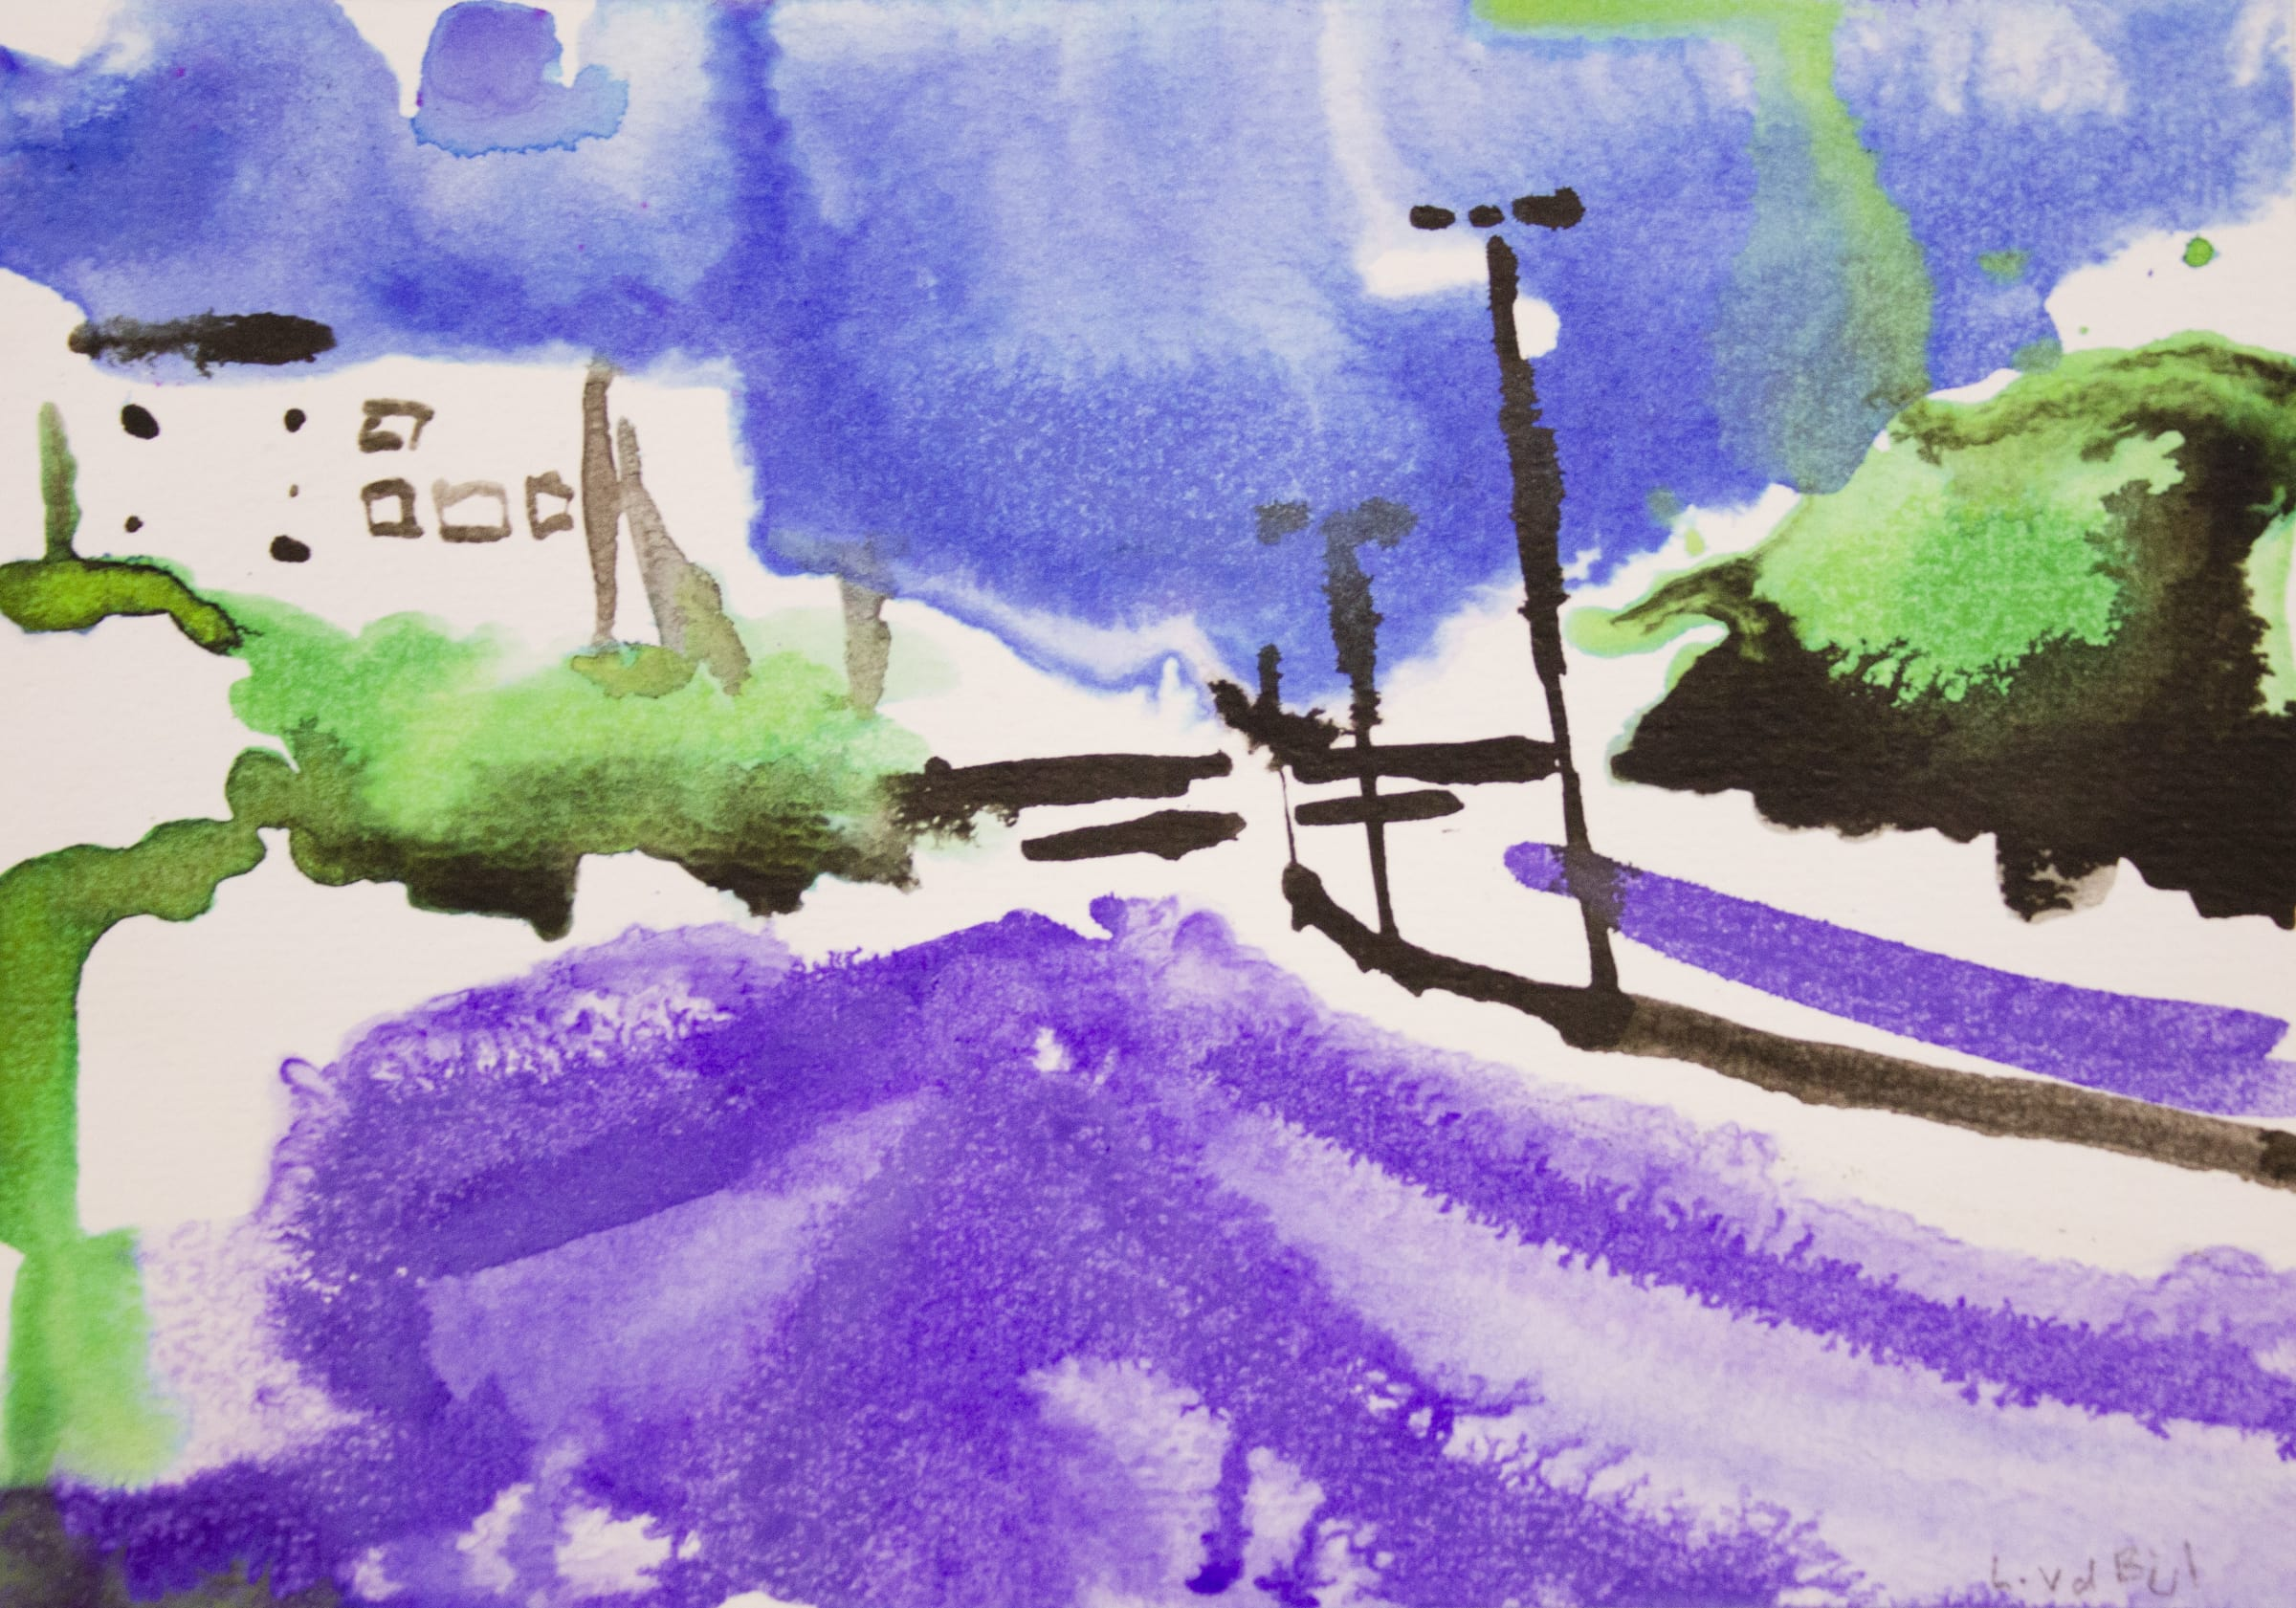 <span class=&#34;link fancybox-details-link&#34;><a href=&#34;/artists/88-louise-van-der-bijl/works/2272-louise-van-der-bijl-inktober-day-10-2018/&#34;>View Detail Page</a></span><div class=&#34;artist&#34;><strong>Louise Van Der Bijl</strong></div> <div class=&#34;title&#34;><em>Inktober Day 10</em>, 2018</div> <div class=&#34;medium&#34;>Ink On Paper</div> <div class=&#34;dimensions&#34;>15.2cm x 21.3cm</div><div class=&#34;price&#34;>R400.00</div>